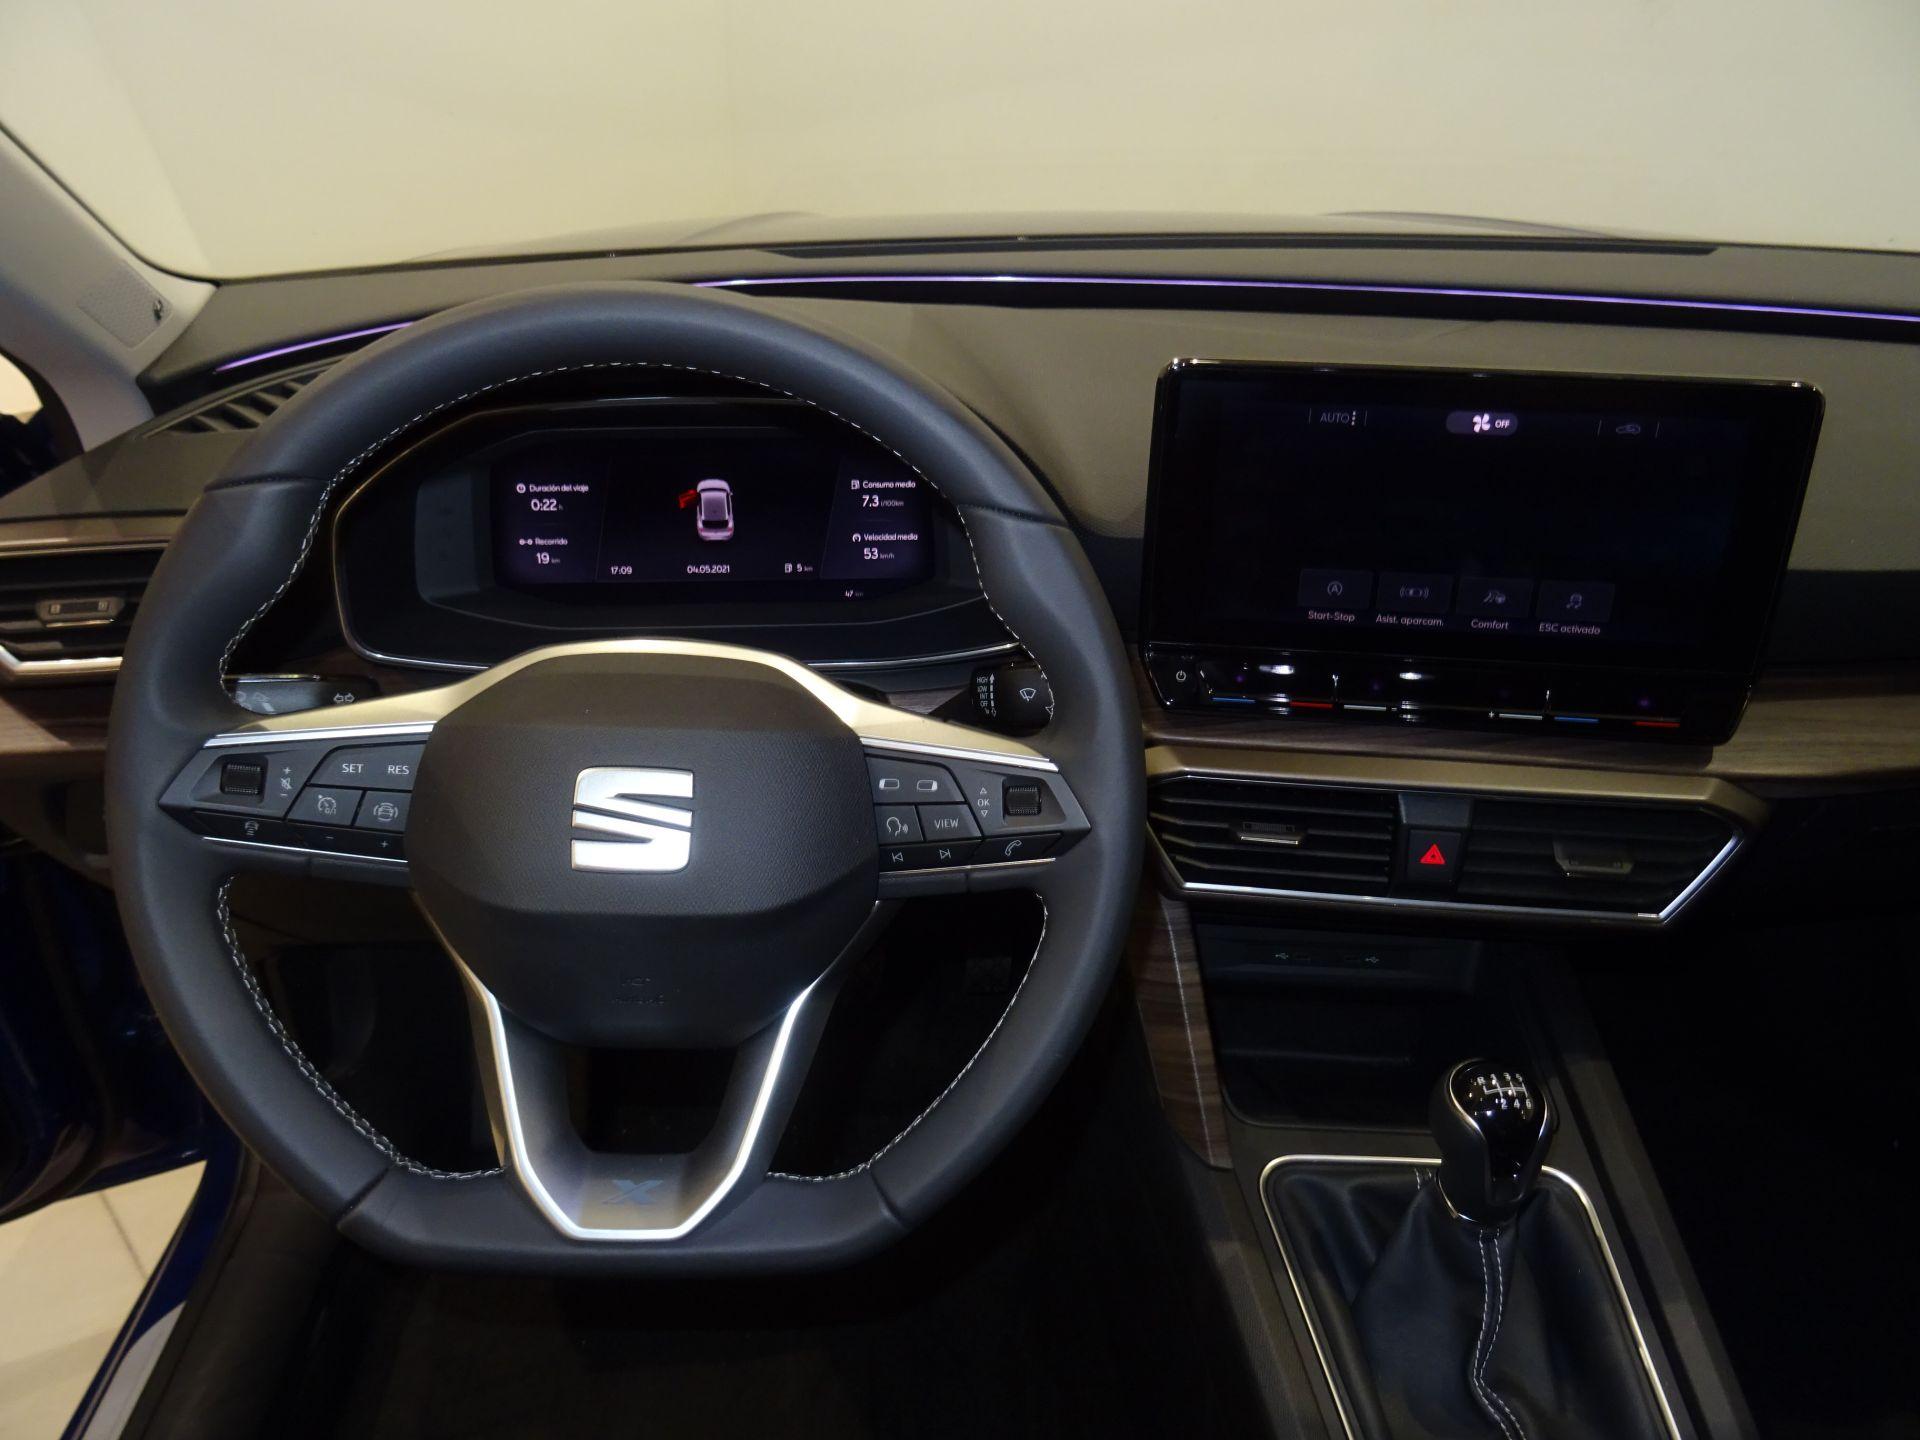 SEAT Nuevo León 1.5 TSI 110kW S&S Xcellence Launch P L